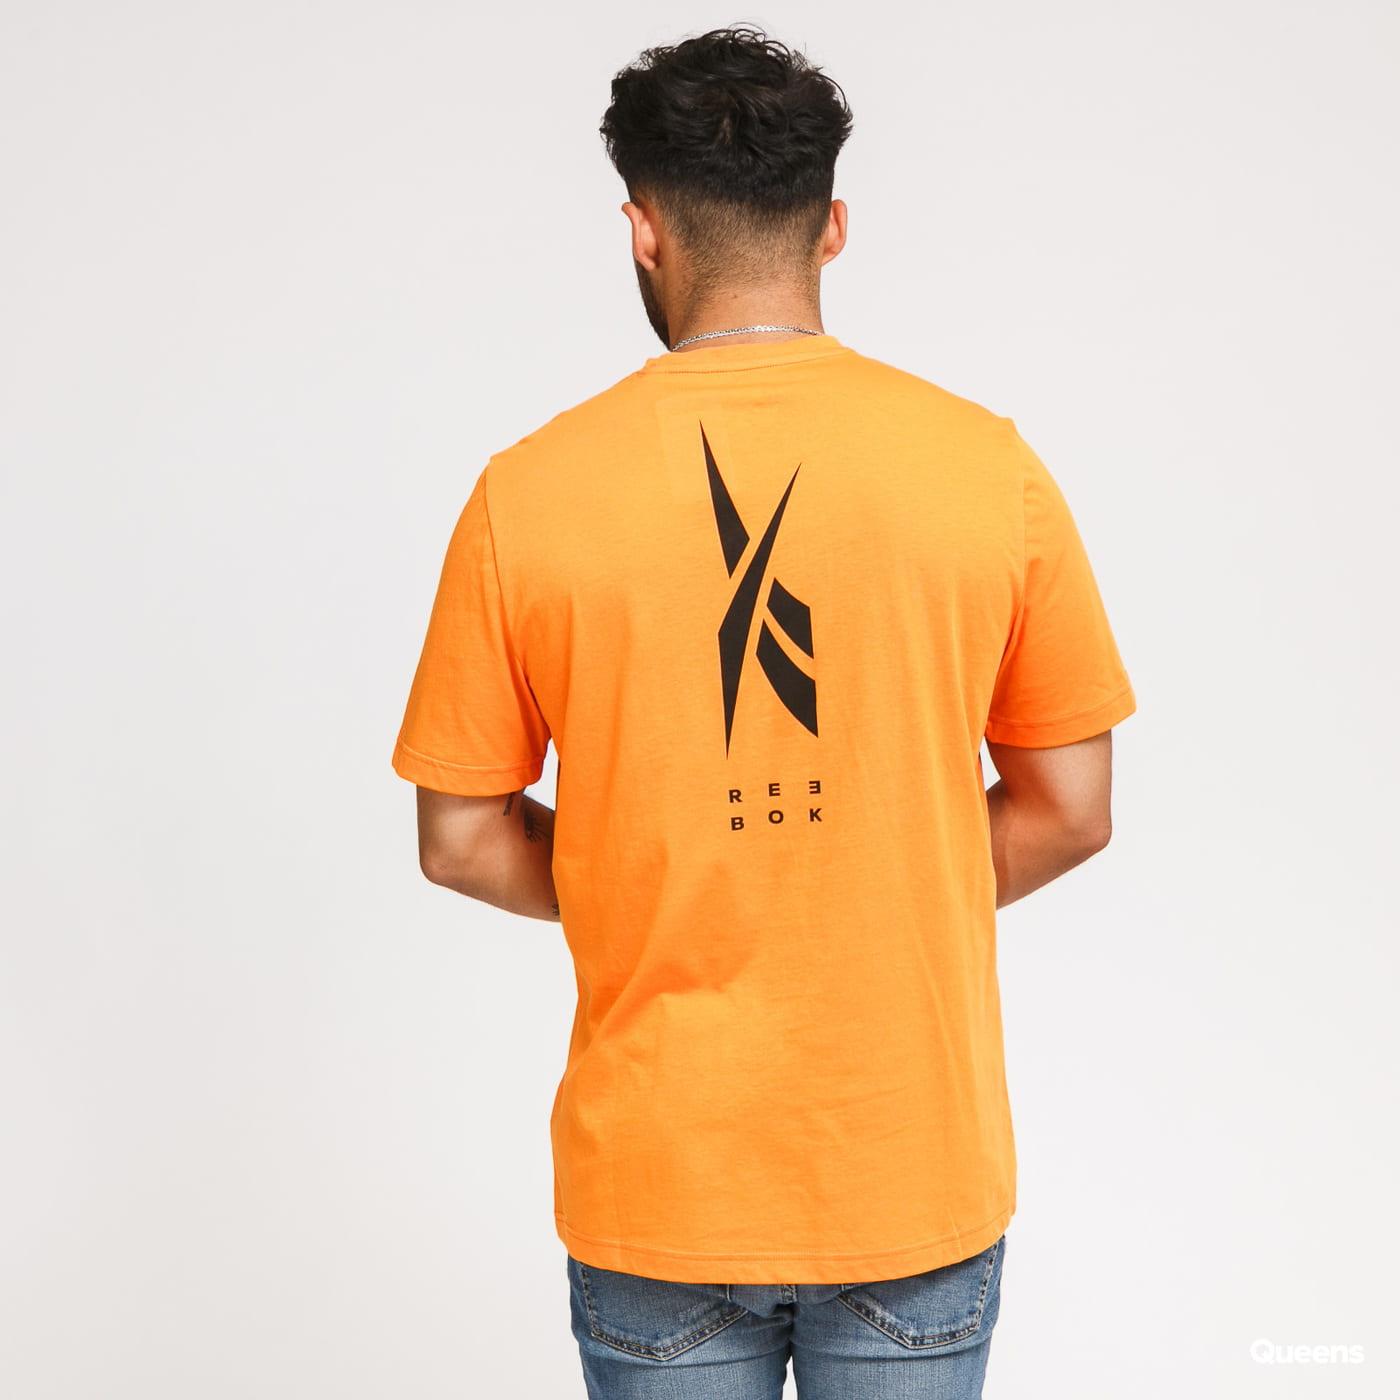 Reebok TS EdgeWorks Graphic Tee oranžové